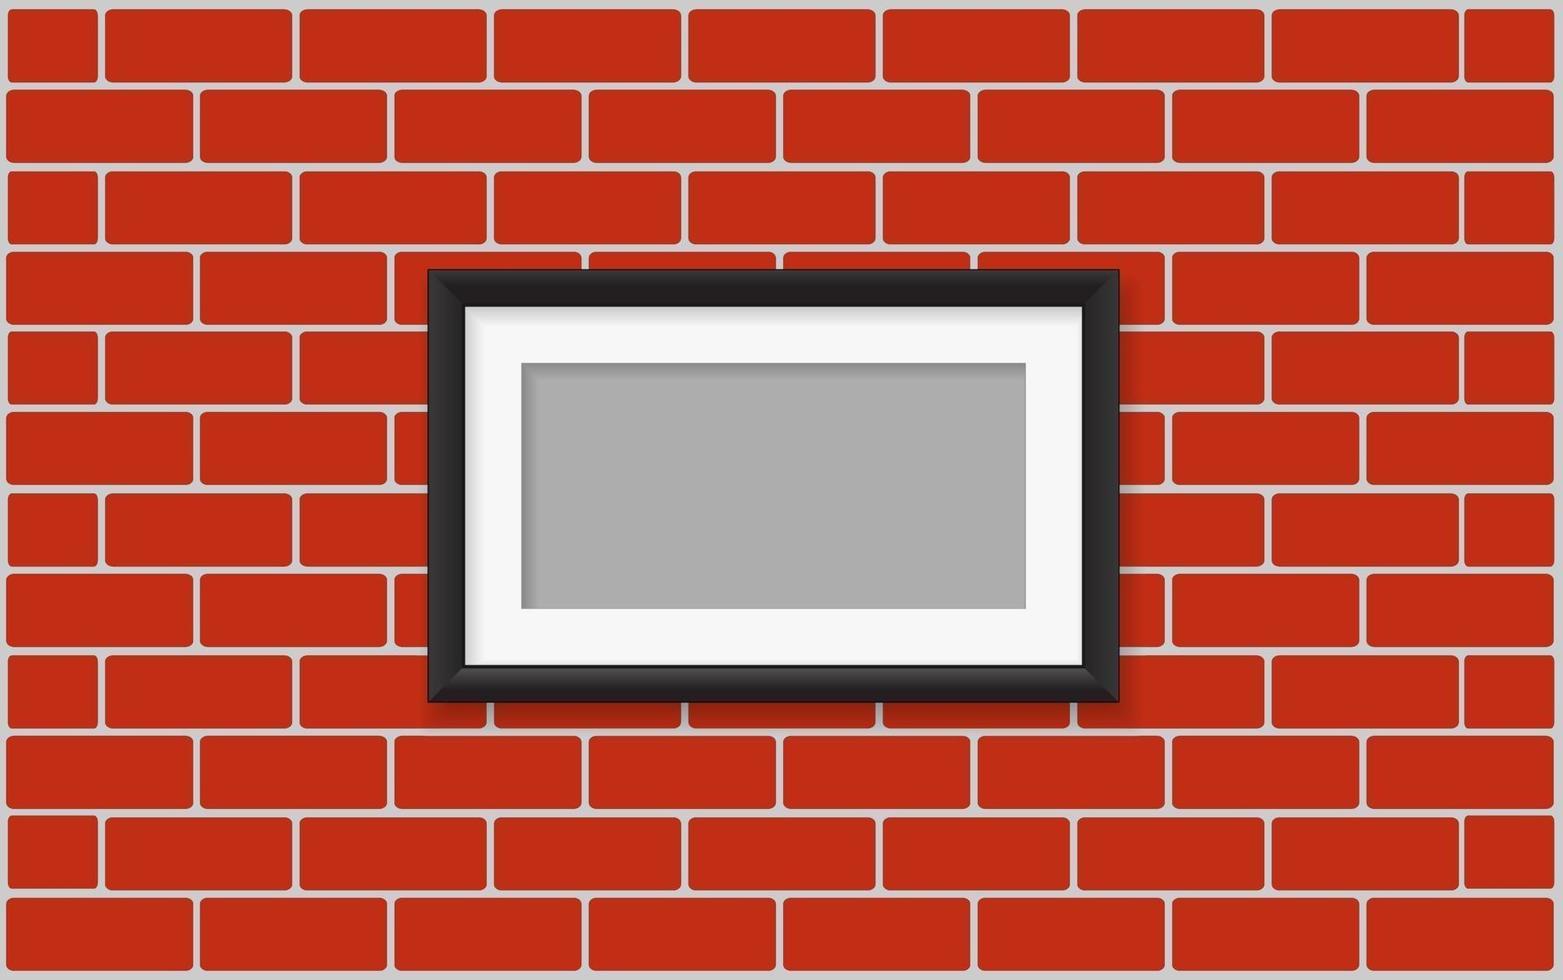 moldura na parede vetor